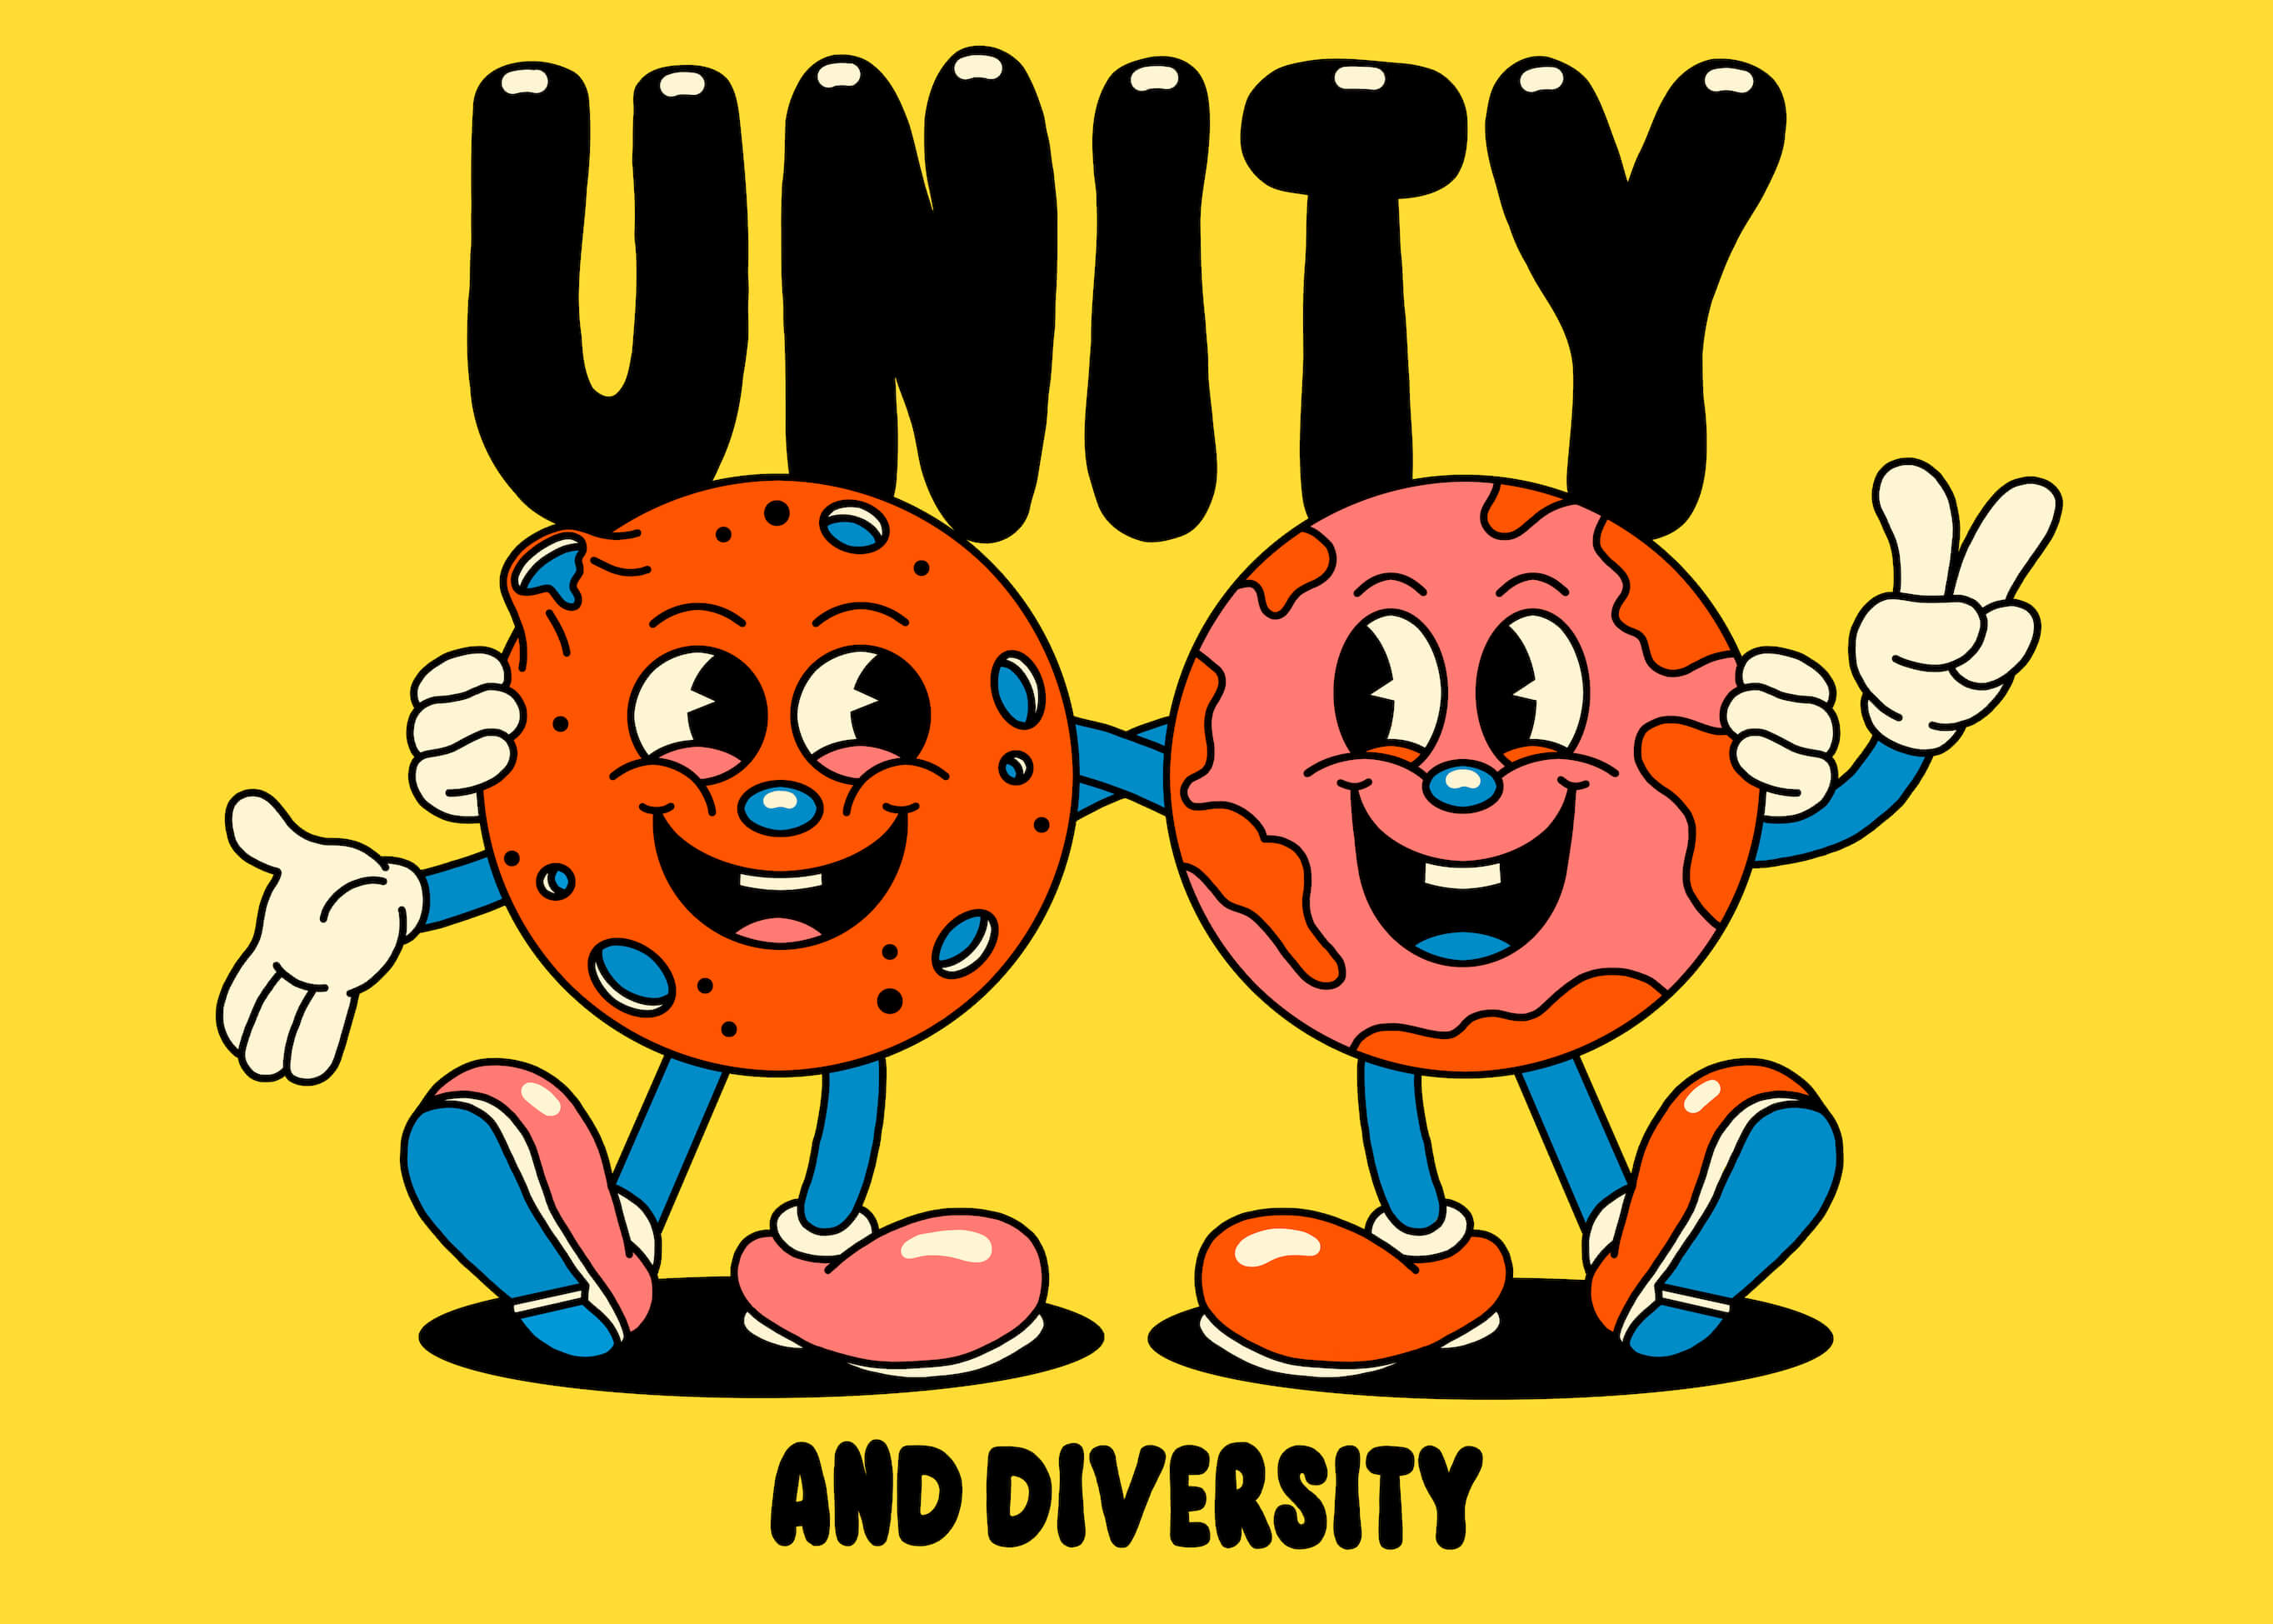 Unity and Diversity main image